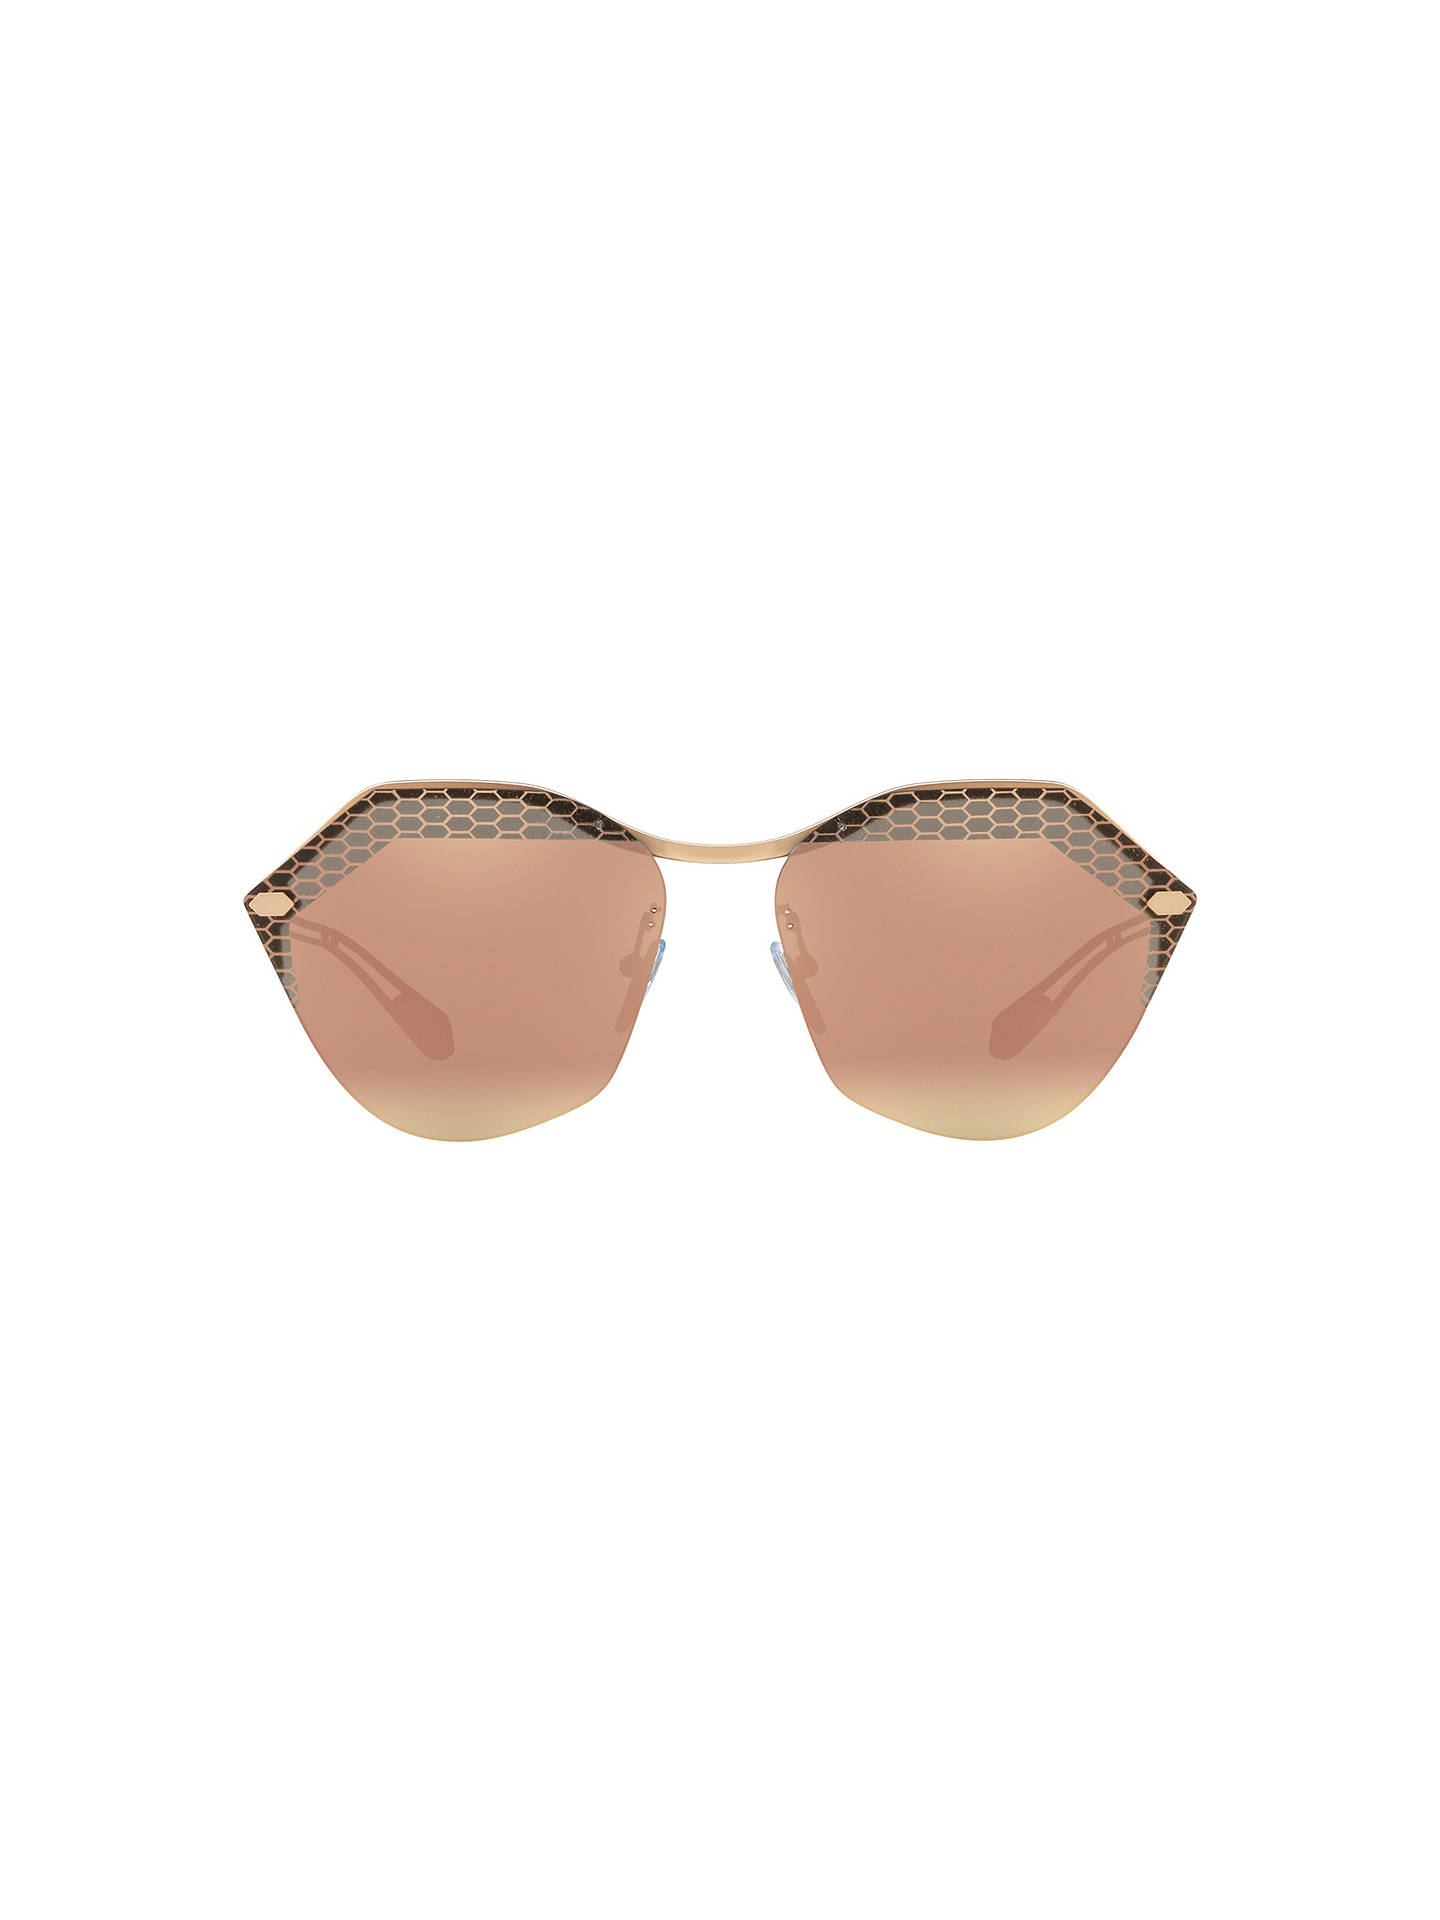 746ddf490f46a BVLGARI BV6109 Women s Irregular Sunglasses at John Lewis   Partners